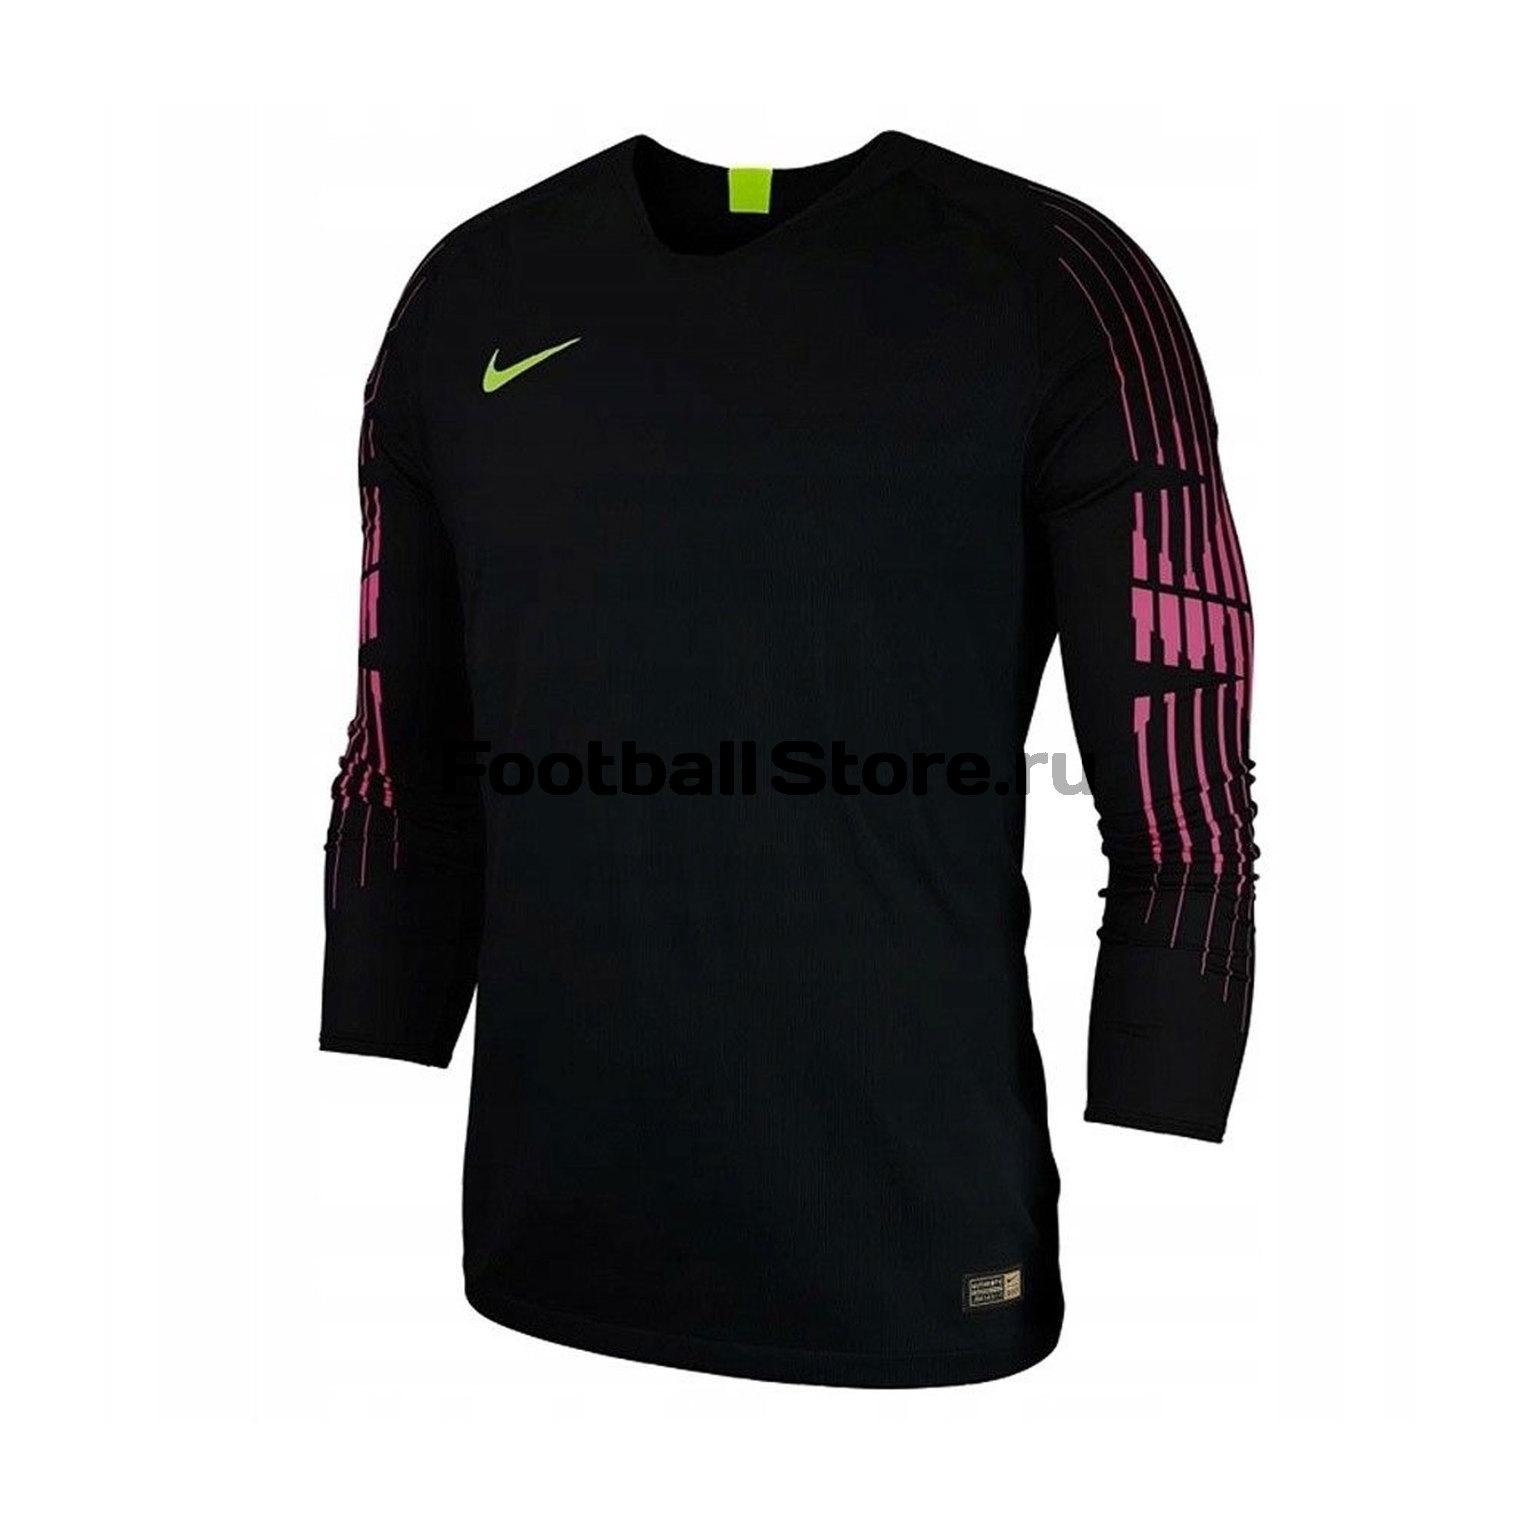 Вратарская футболка Nike Gardien II GK 898043-010